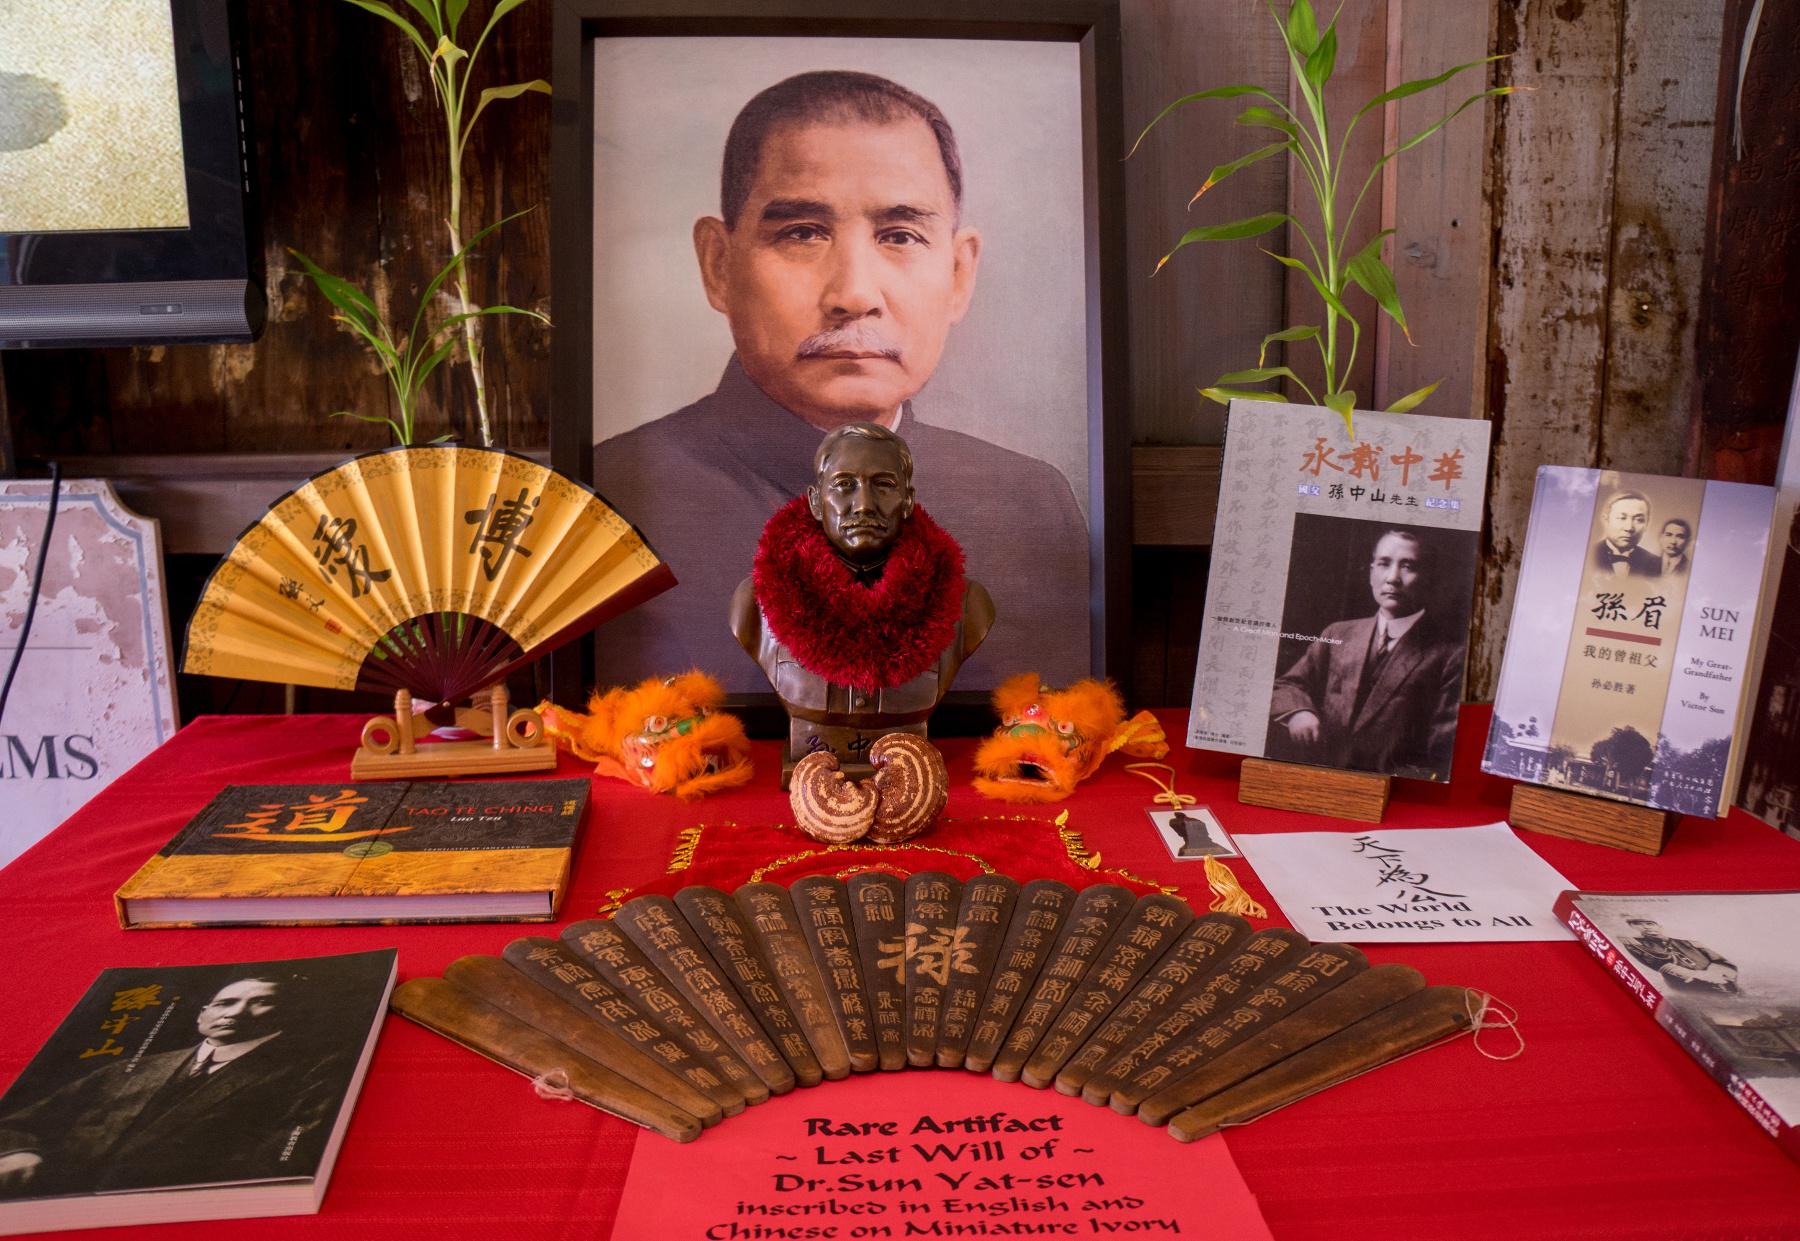 Sun Yat Sen tribute display at Wo Hing Museum & Cookhouse. File photo 2015 credit: Melanie Agrabante